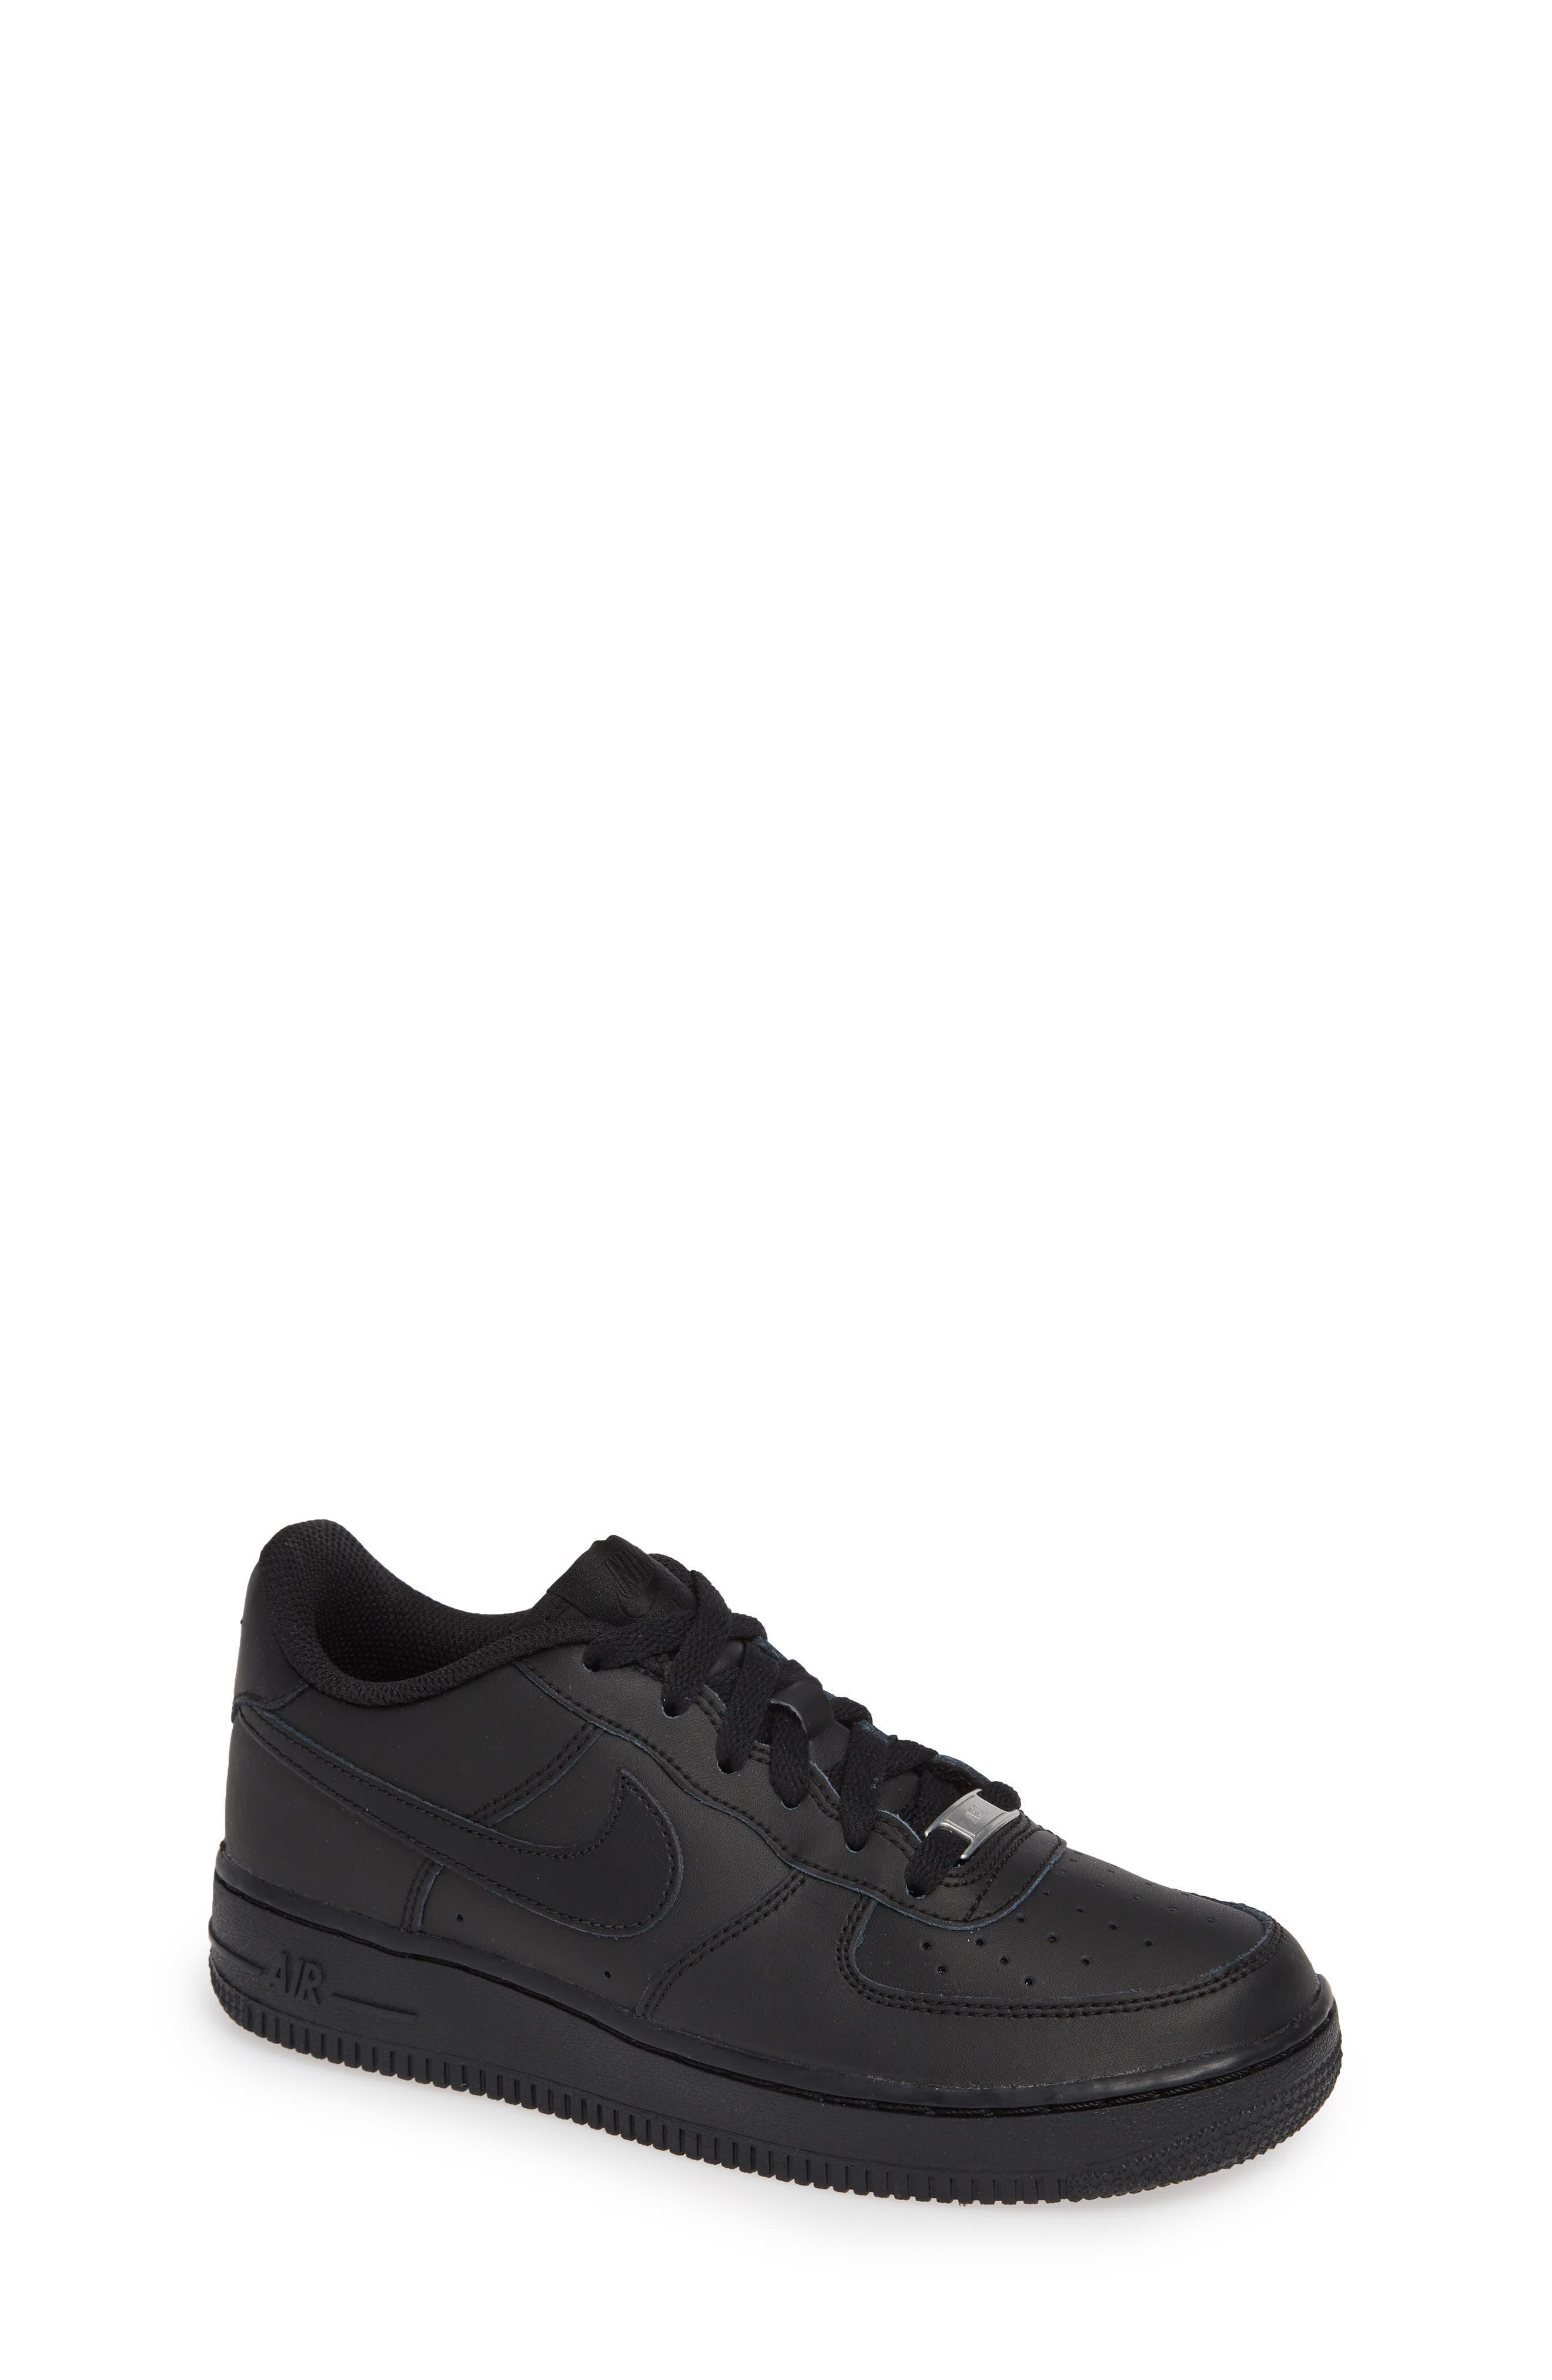 NIKE, Air Force 1 Sneaker, Main thumbnail 1, color, BLACK/ BLACK/ BLACK